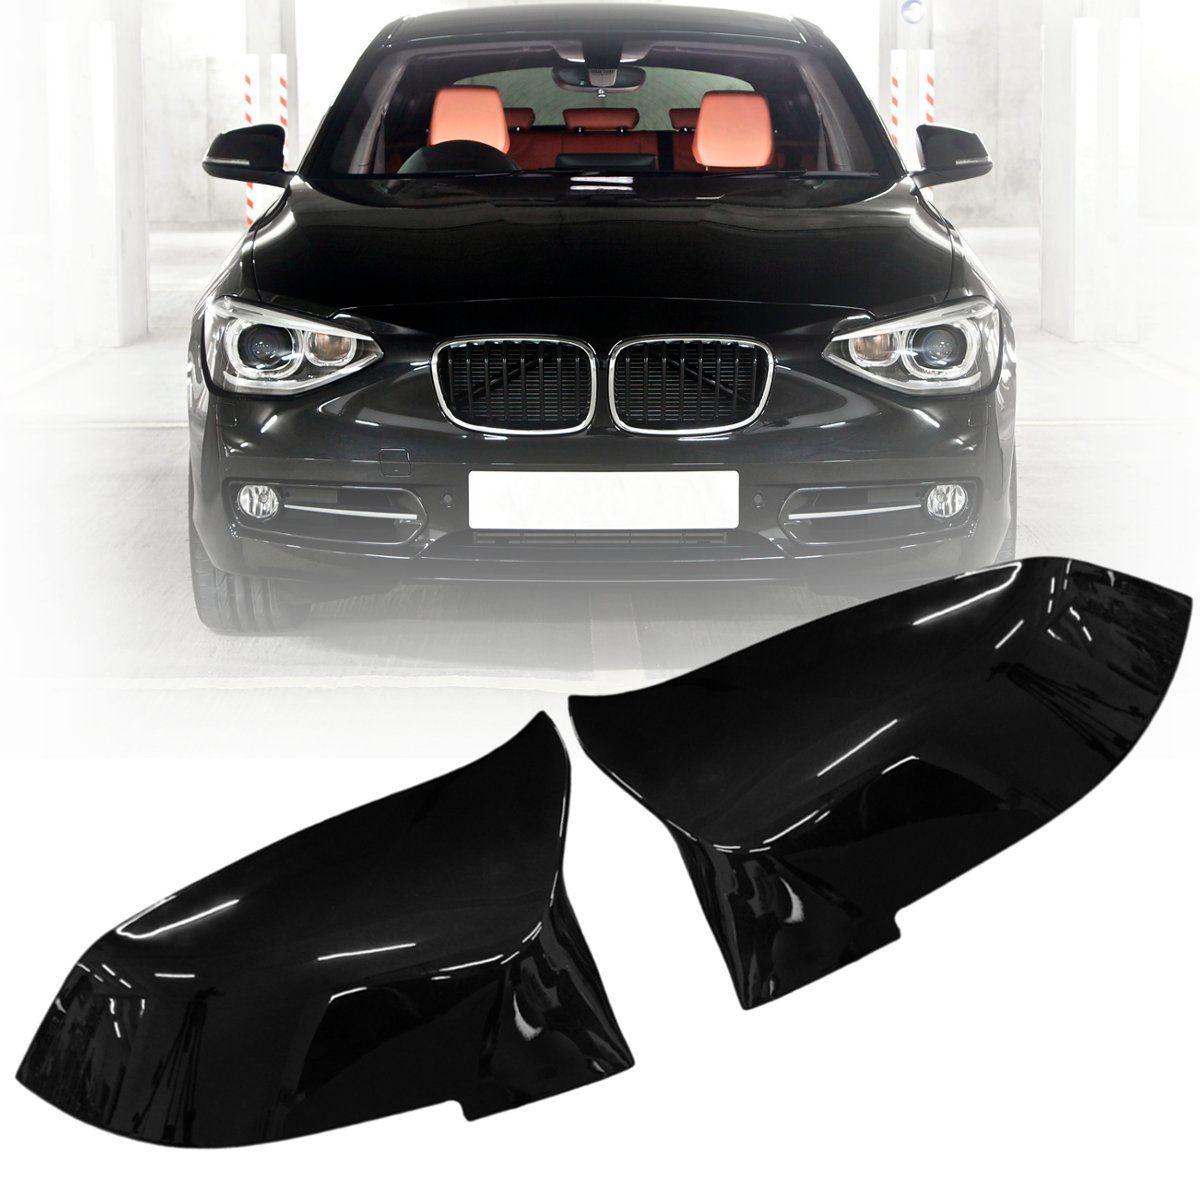 Pair Gloss Black Rearview Mirror Cover For BMW F20 F21 F22 F30 F32 F36 X1 F87 M3 2012 2013 2014 2015 2016 2017